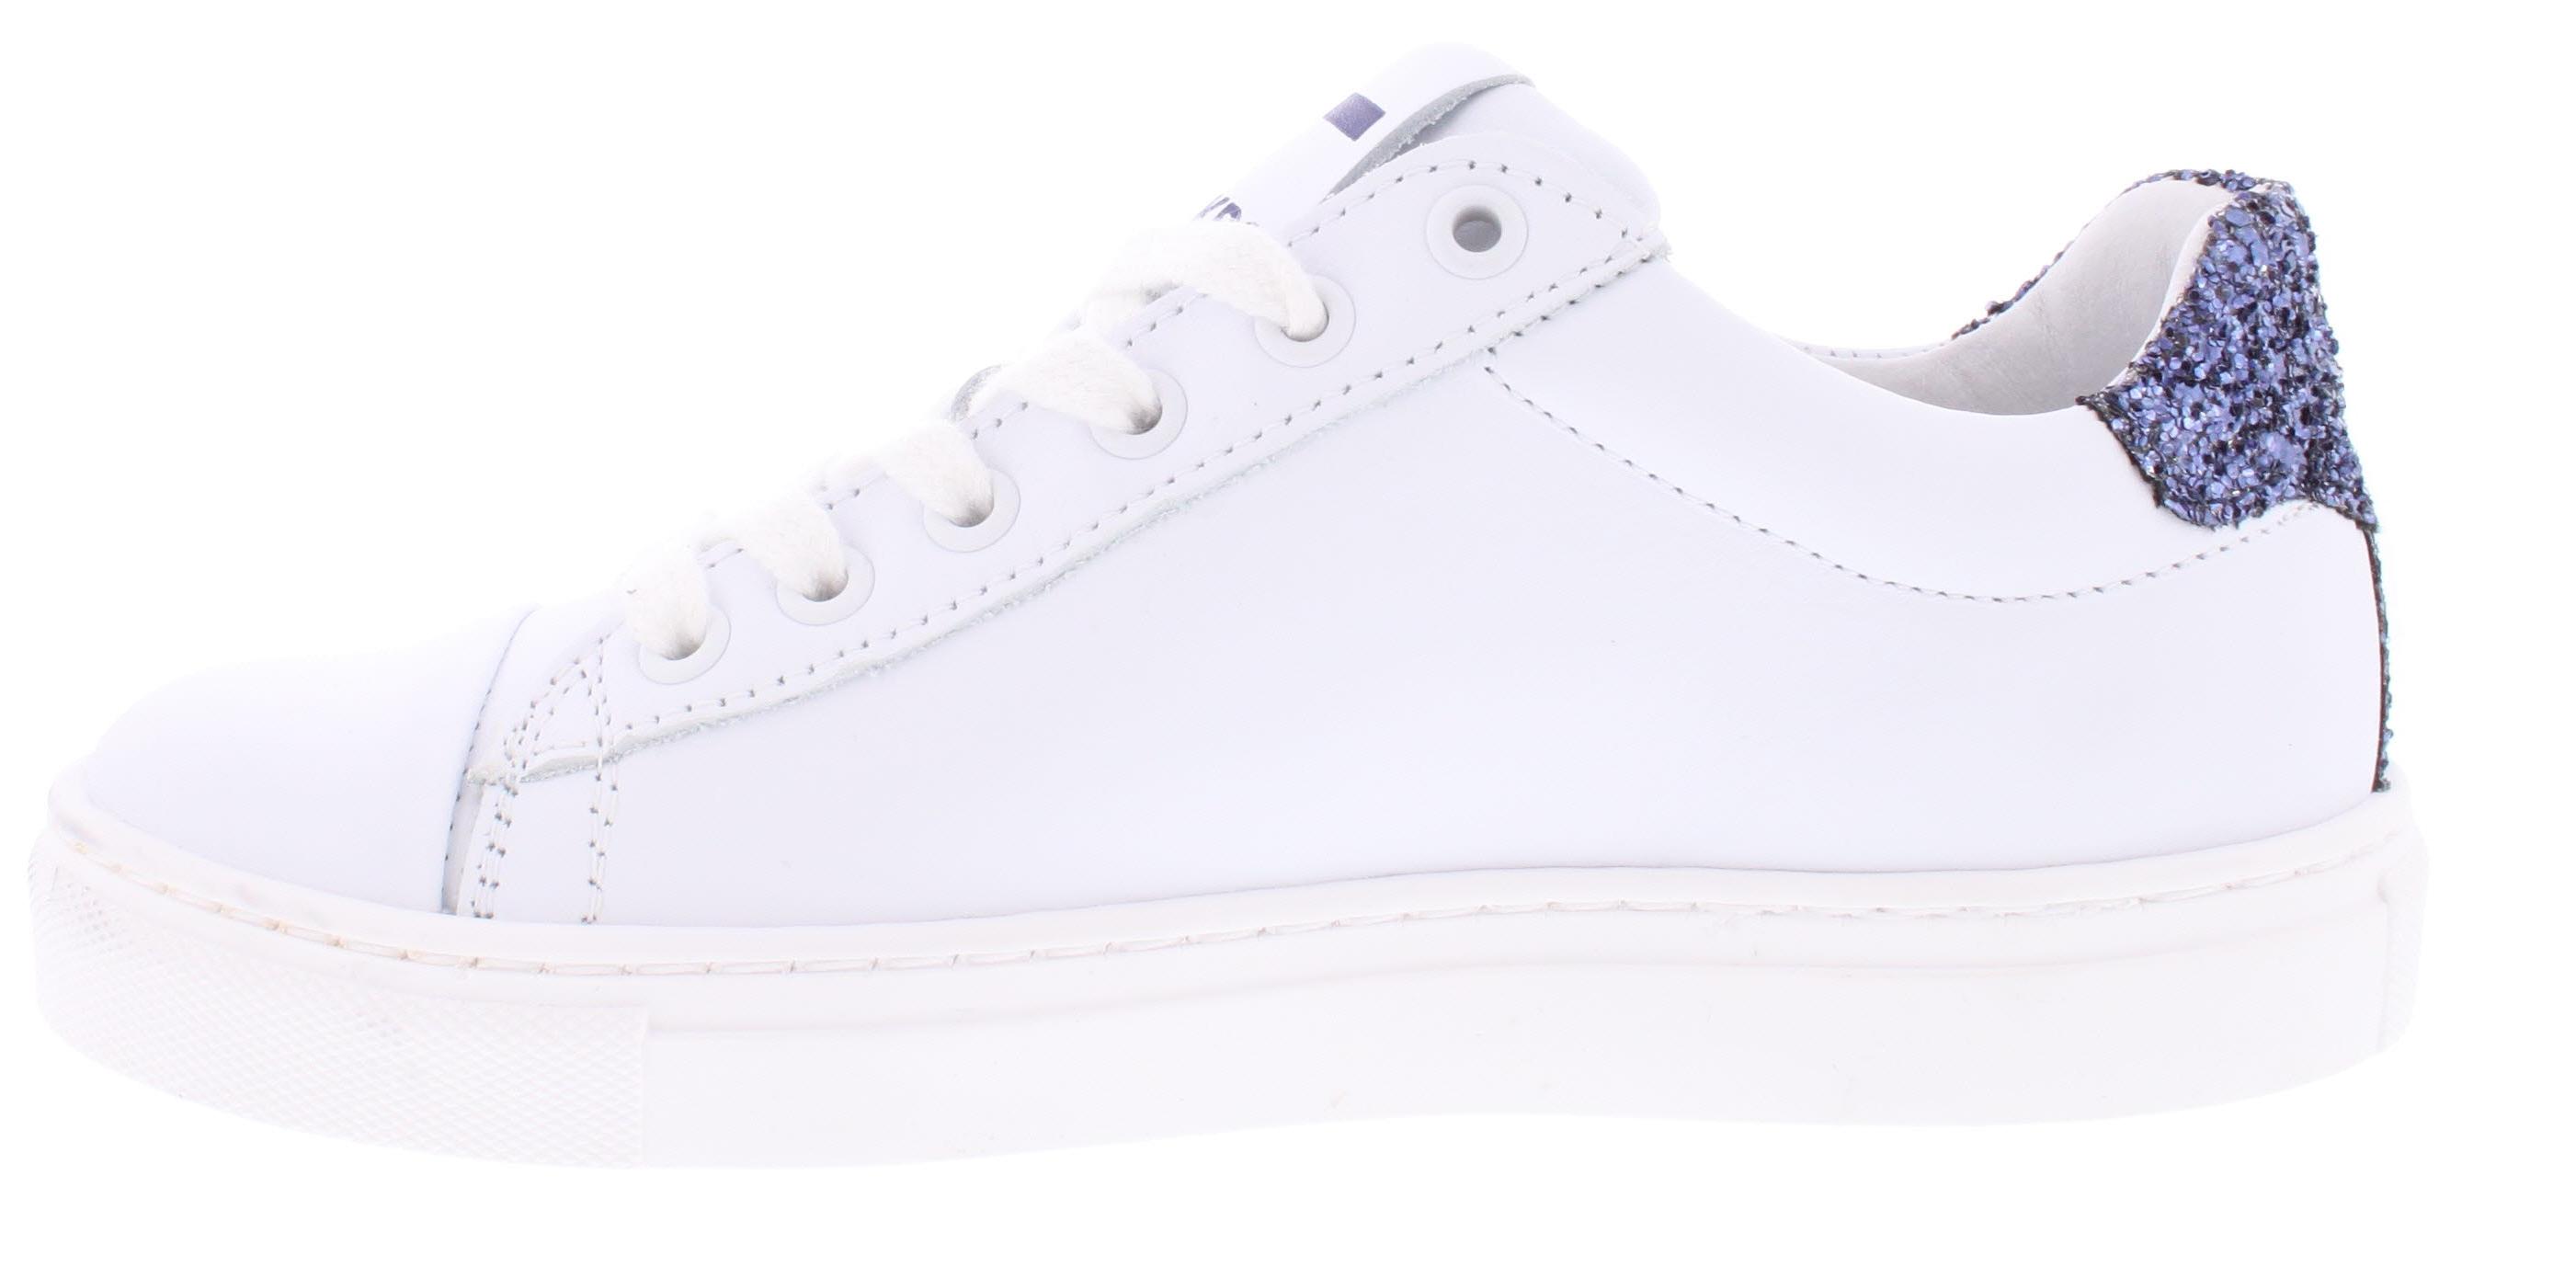 31fdac9bf62 Wit Gladleren Piedro Sneaker   1117625110 - 9906 - Piedroshop.nl